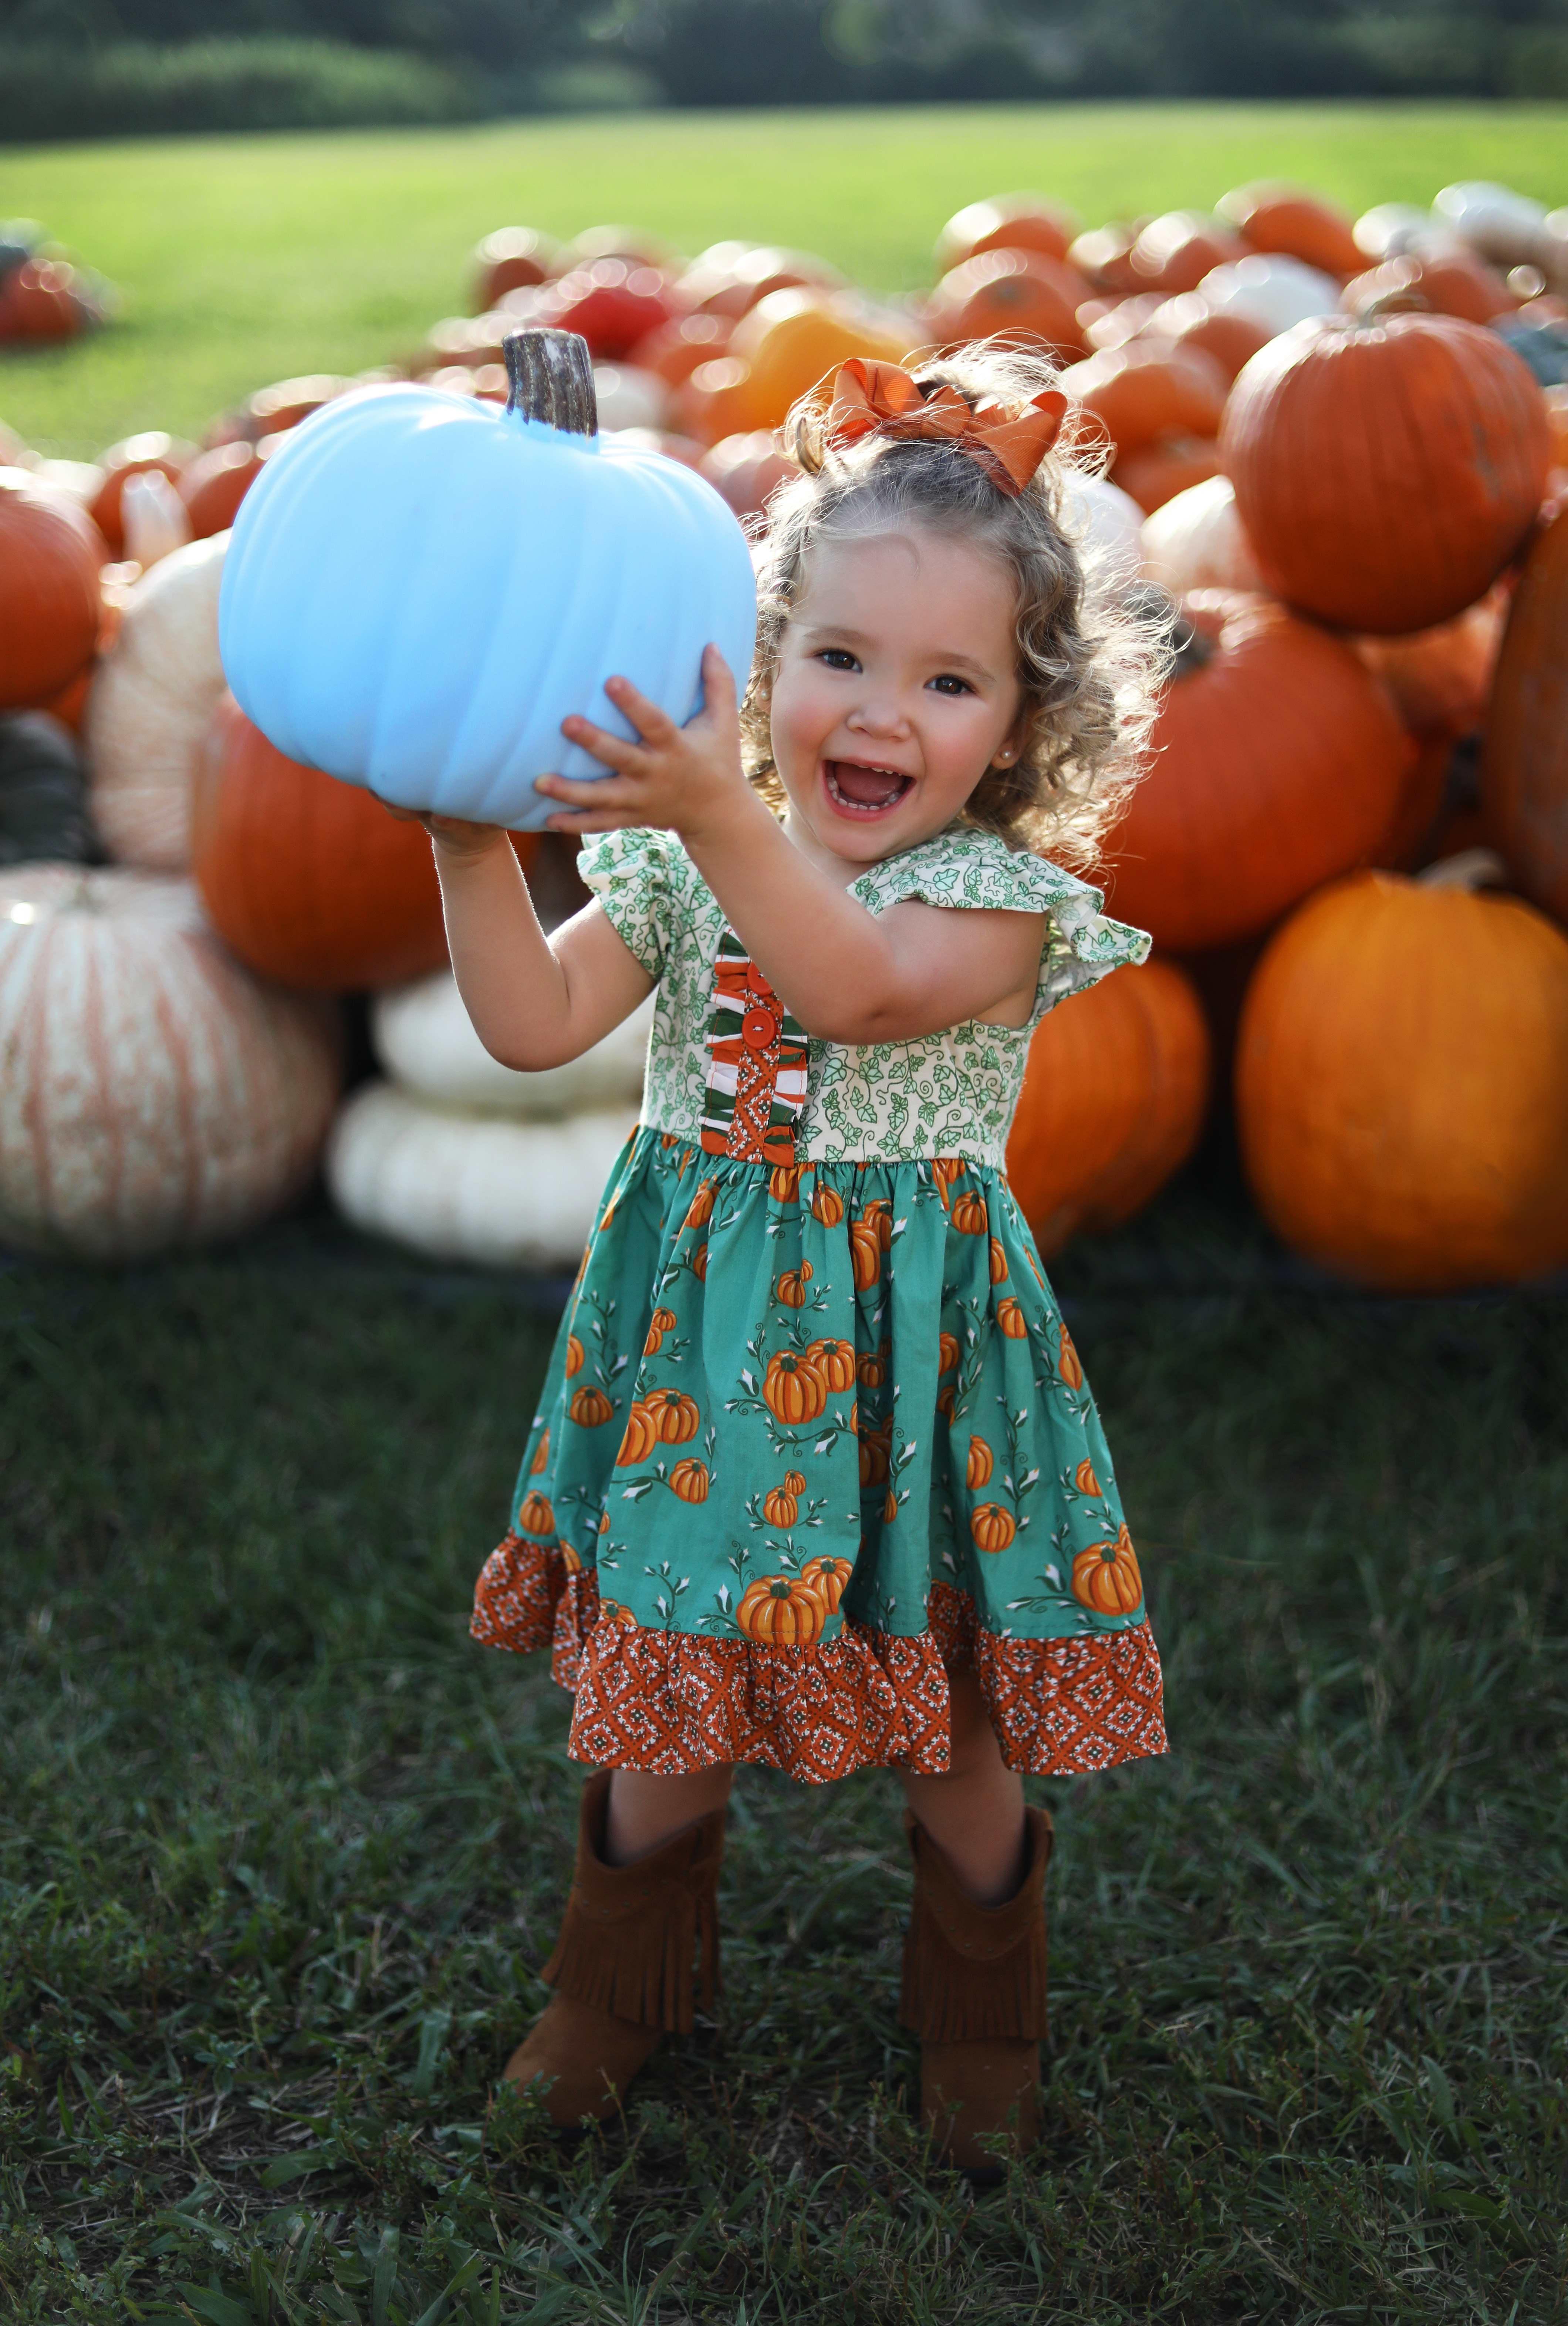 – 19 a Gender reveal family portrait photographer katherine eastman photography miami south florida birthday fairytale maternity newborn fall